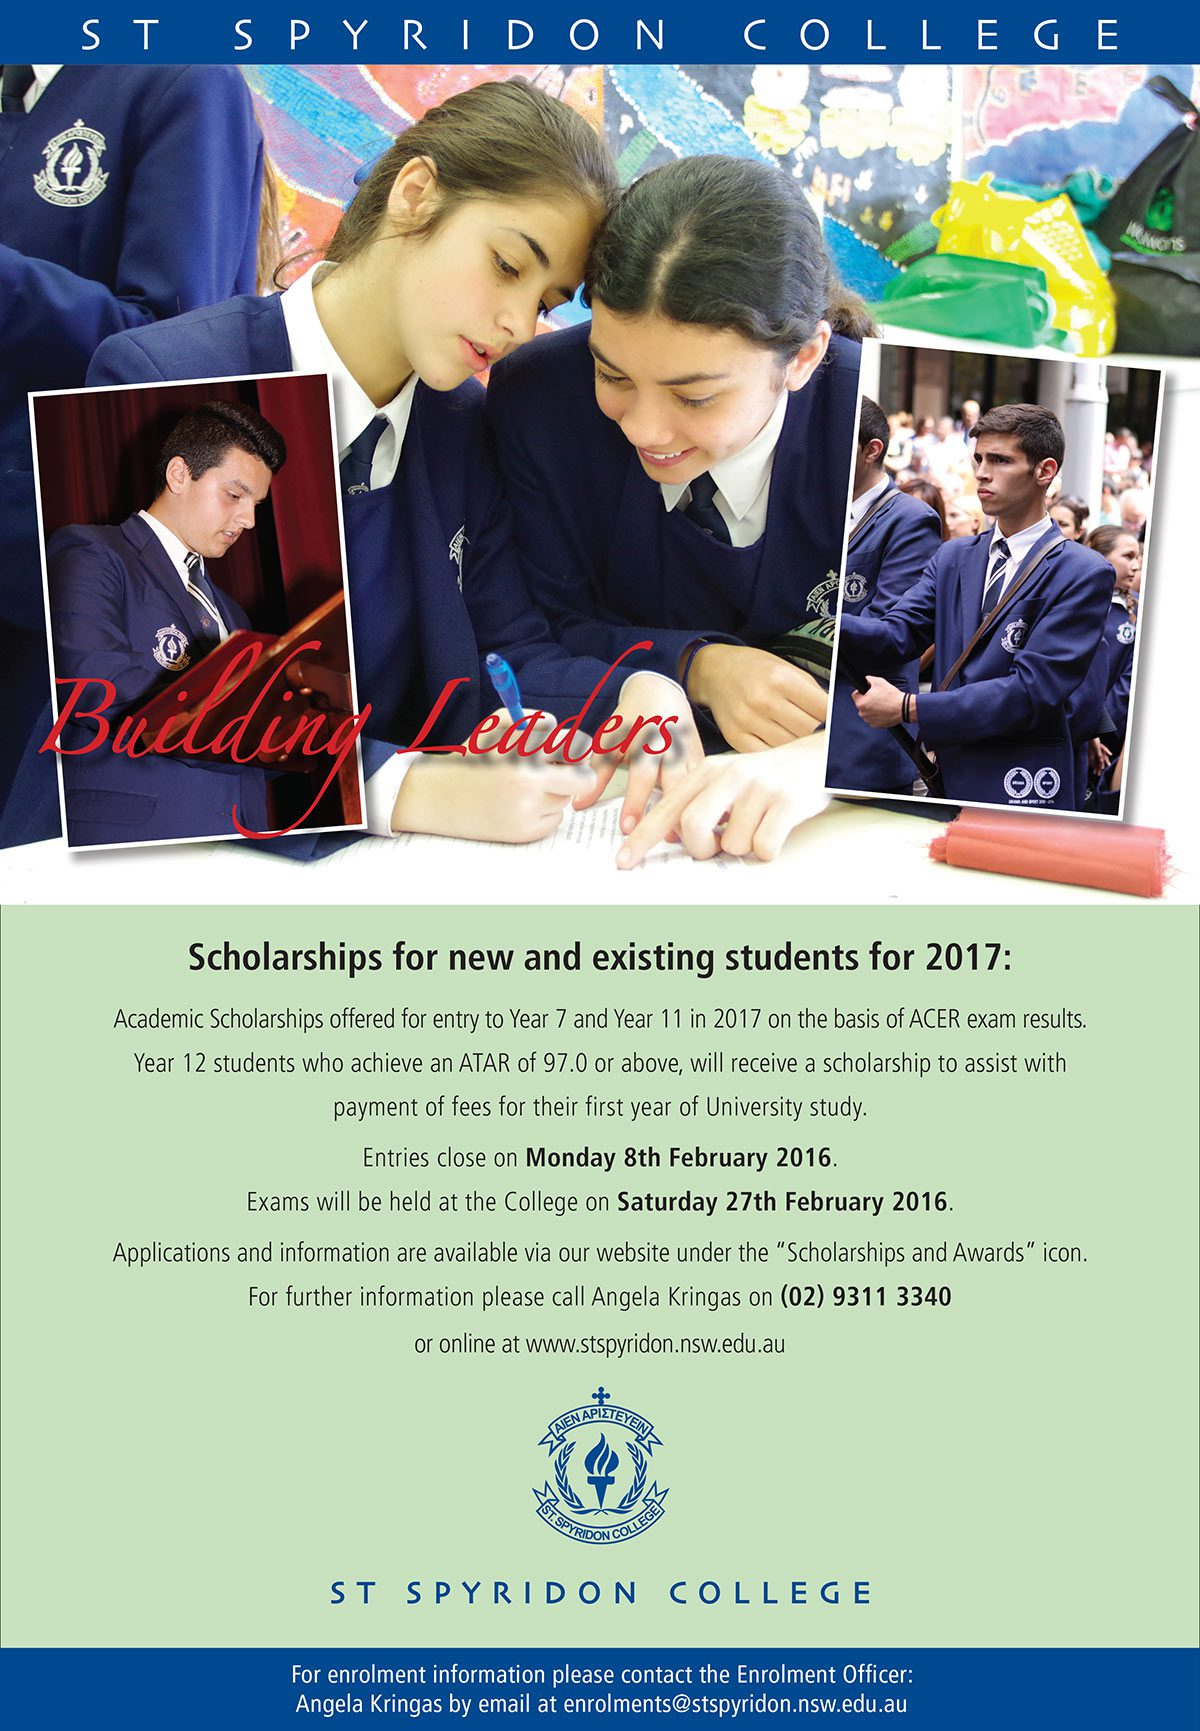 SSC-Scholarship-2017-Web